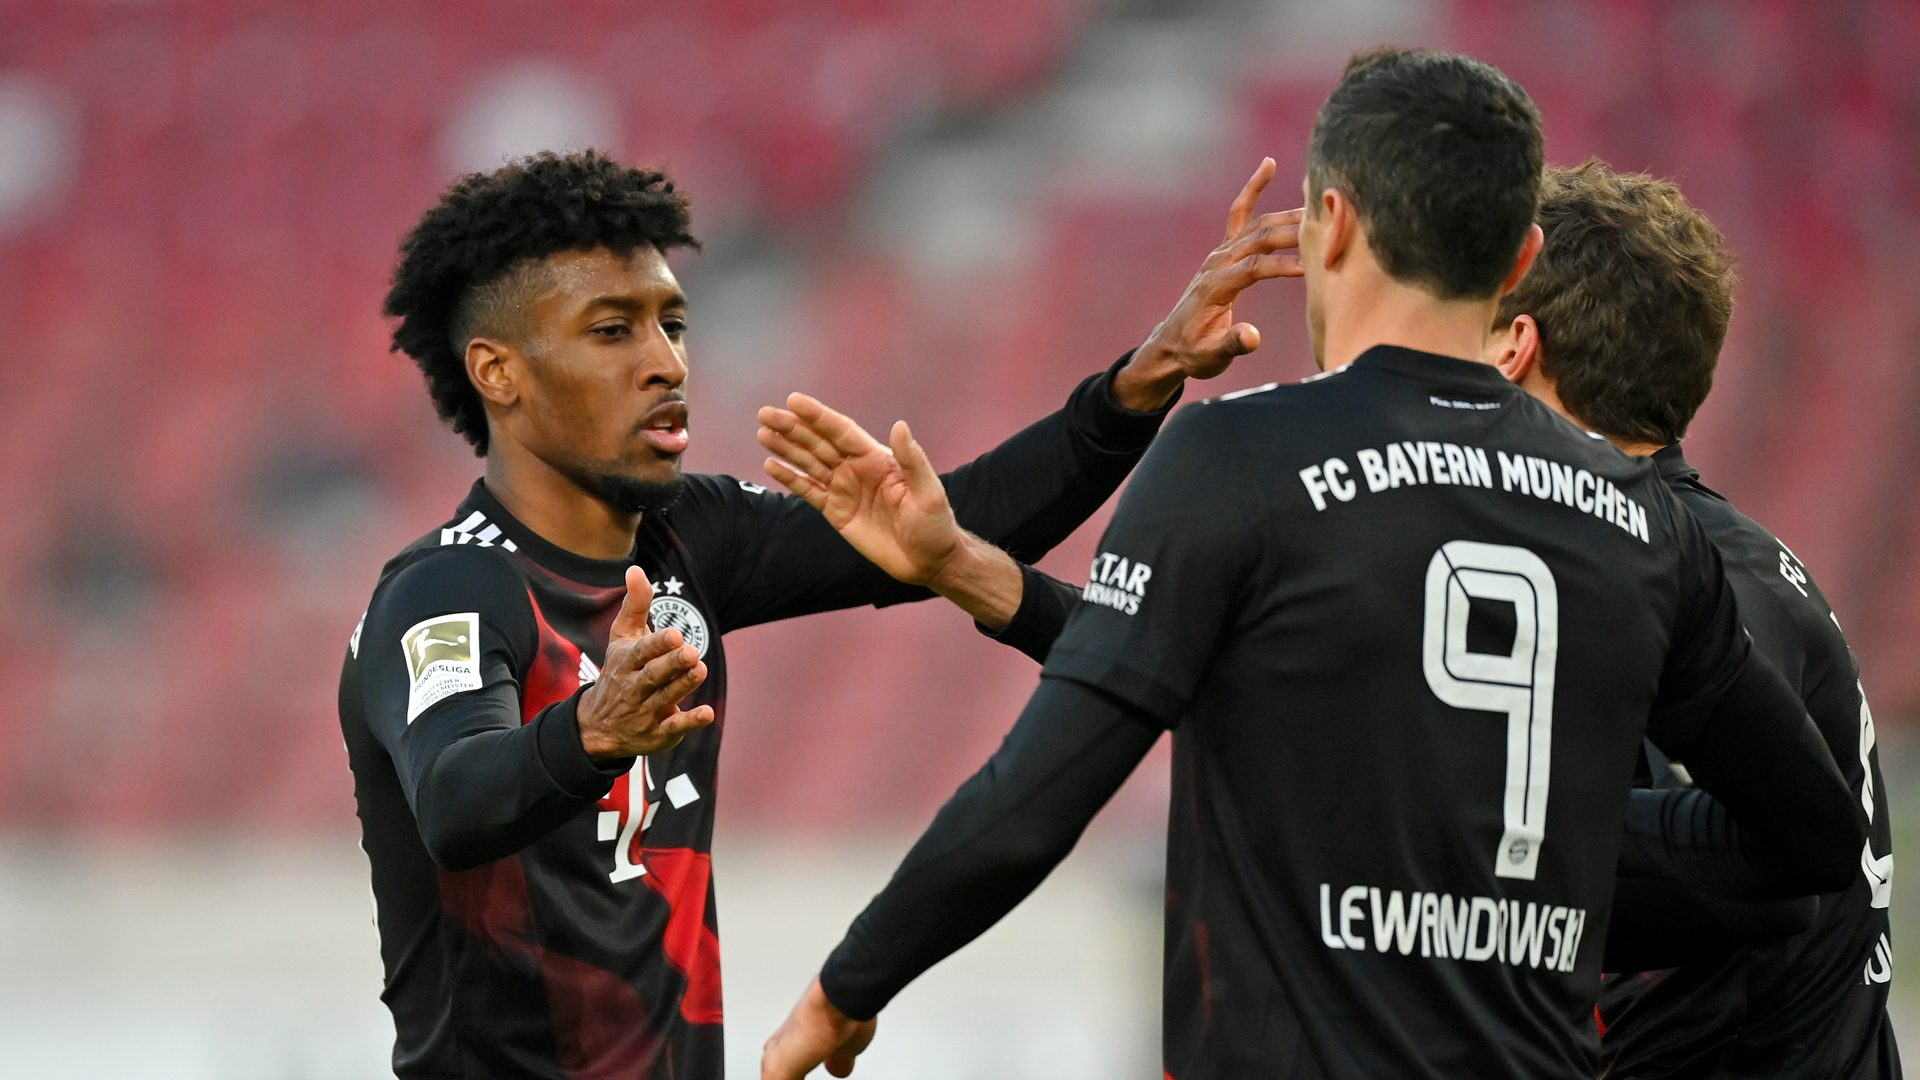 Bundesliga | Robert Lewandowski hits stunner as Bayern Munich come from  behind to beat VfB Stuttgart